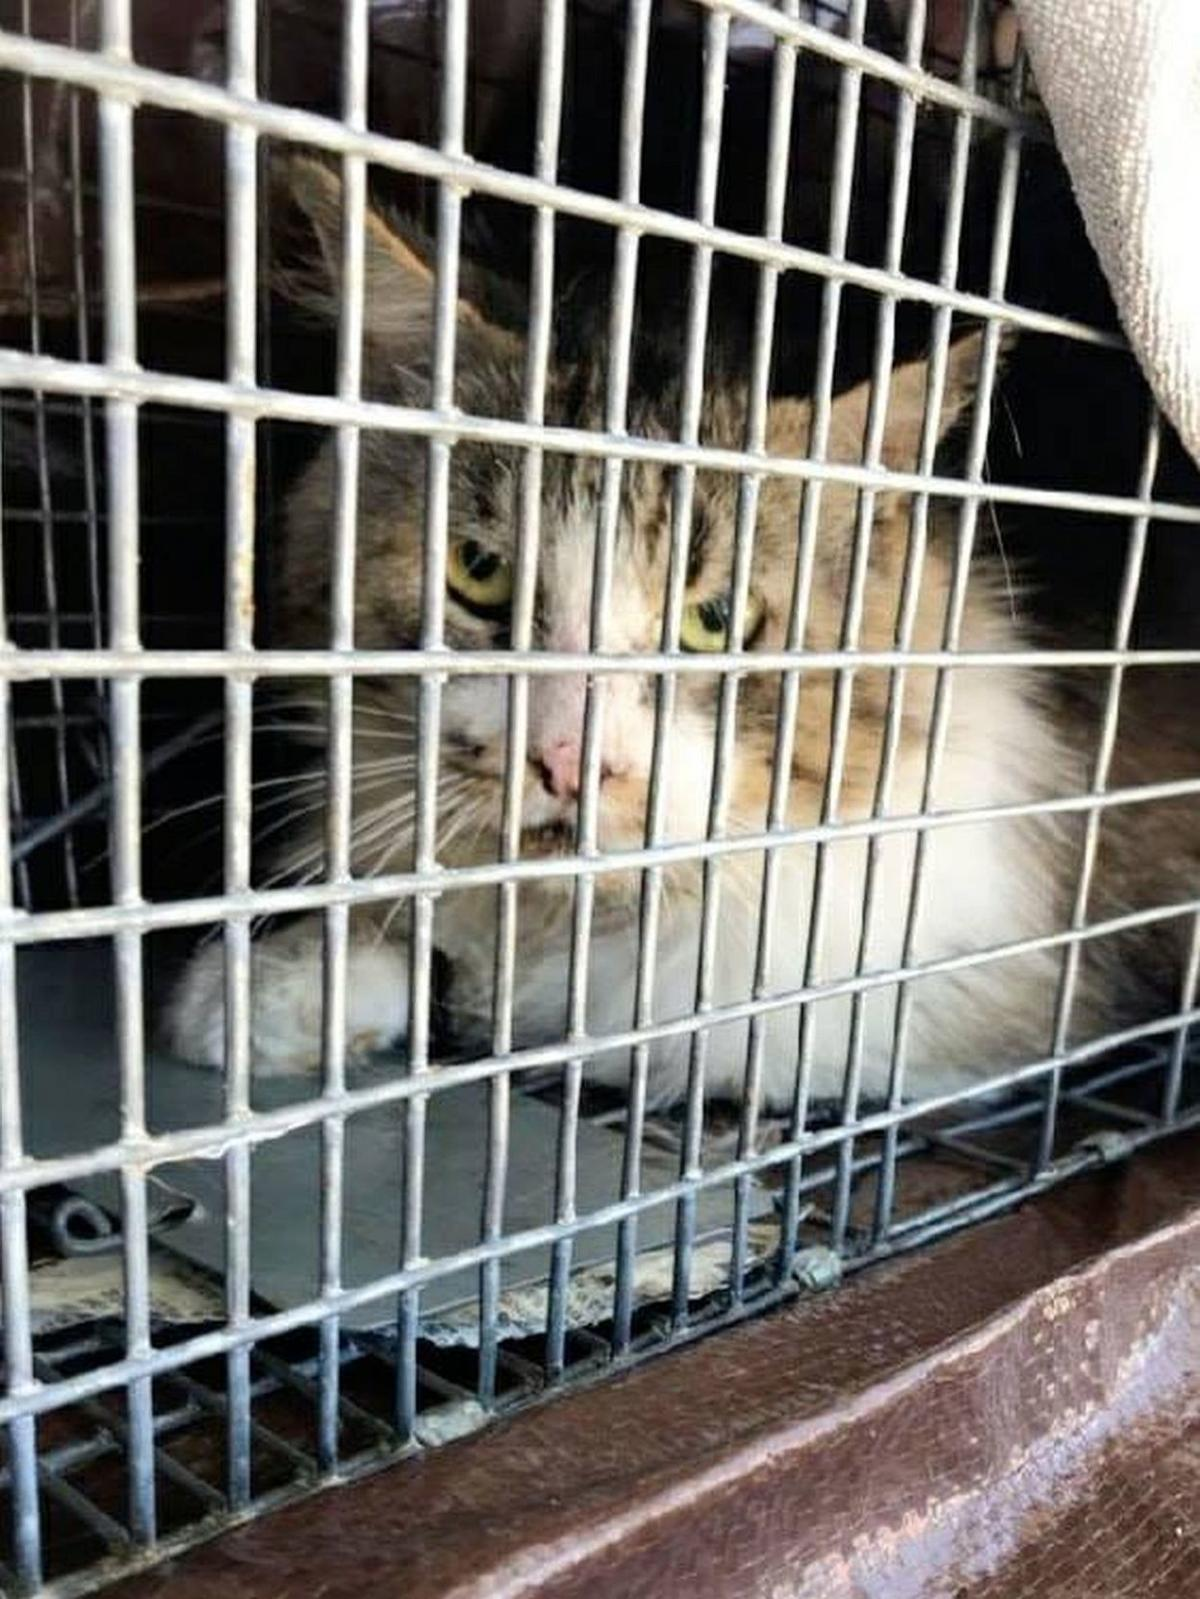 Adopt a Pet | Donate to Spay/Neuter